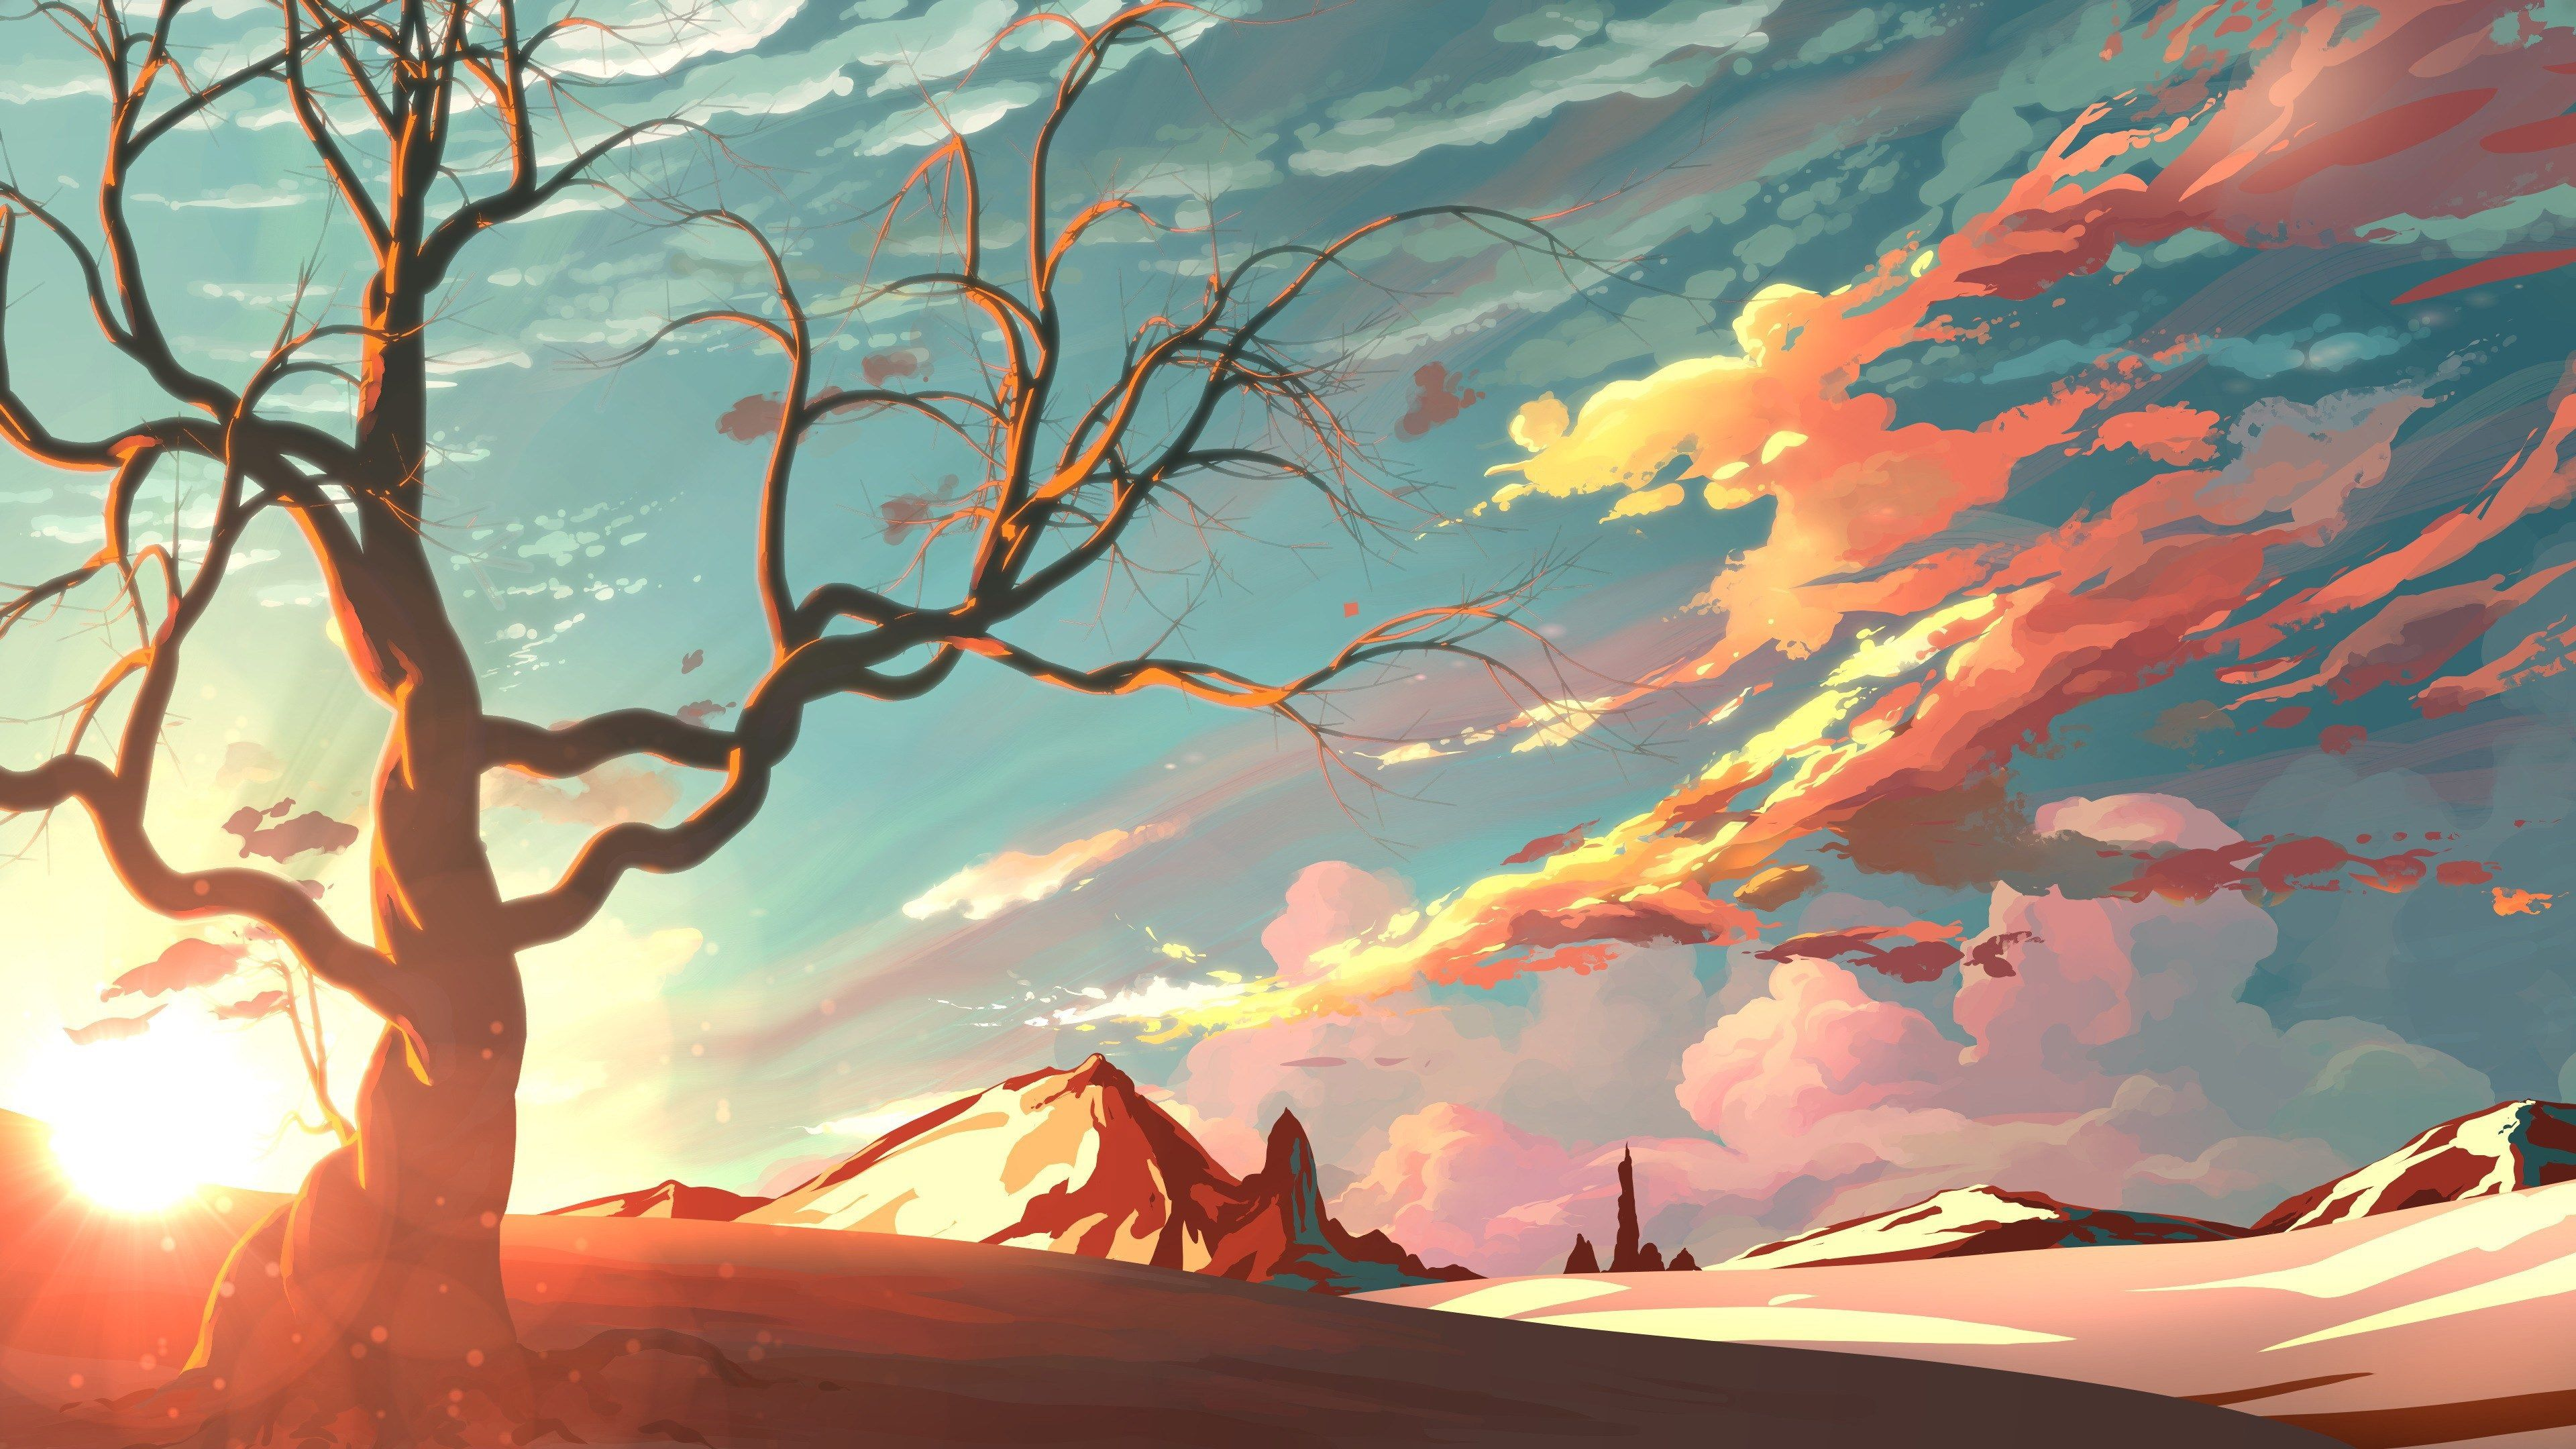 3840x2160 digital art 4k wallpaper high resolution Anime scenery 3840x2160